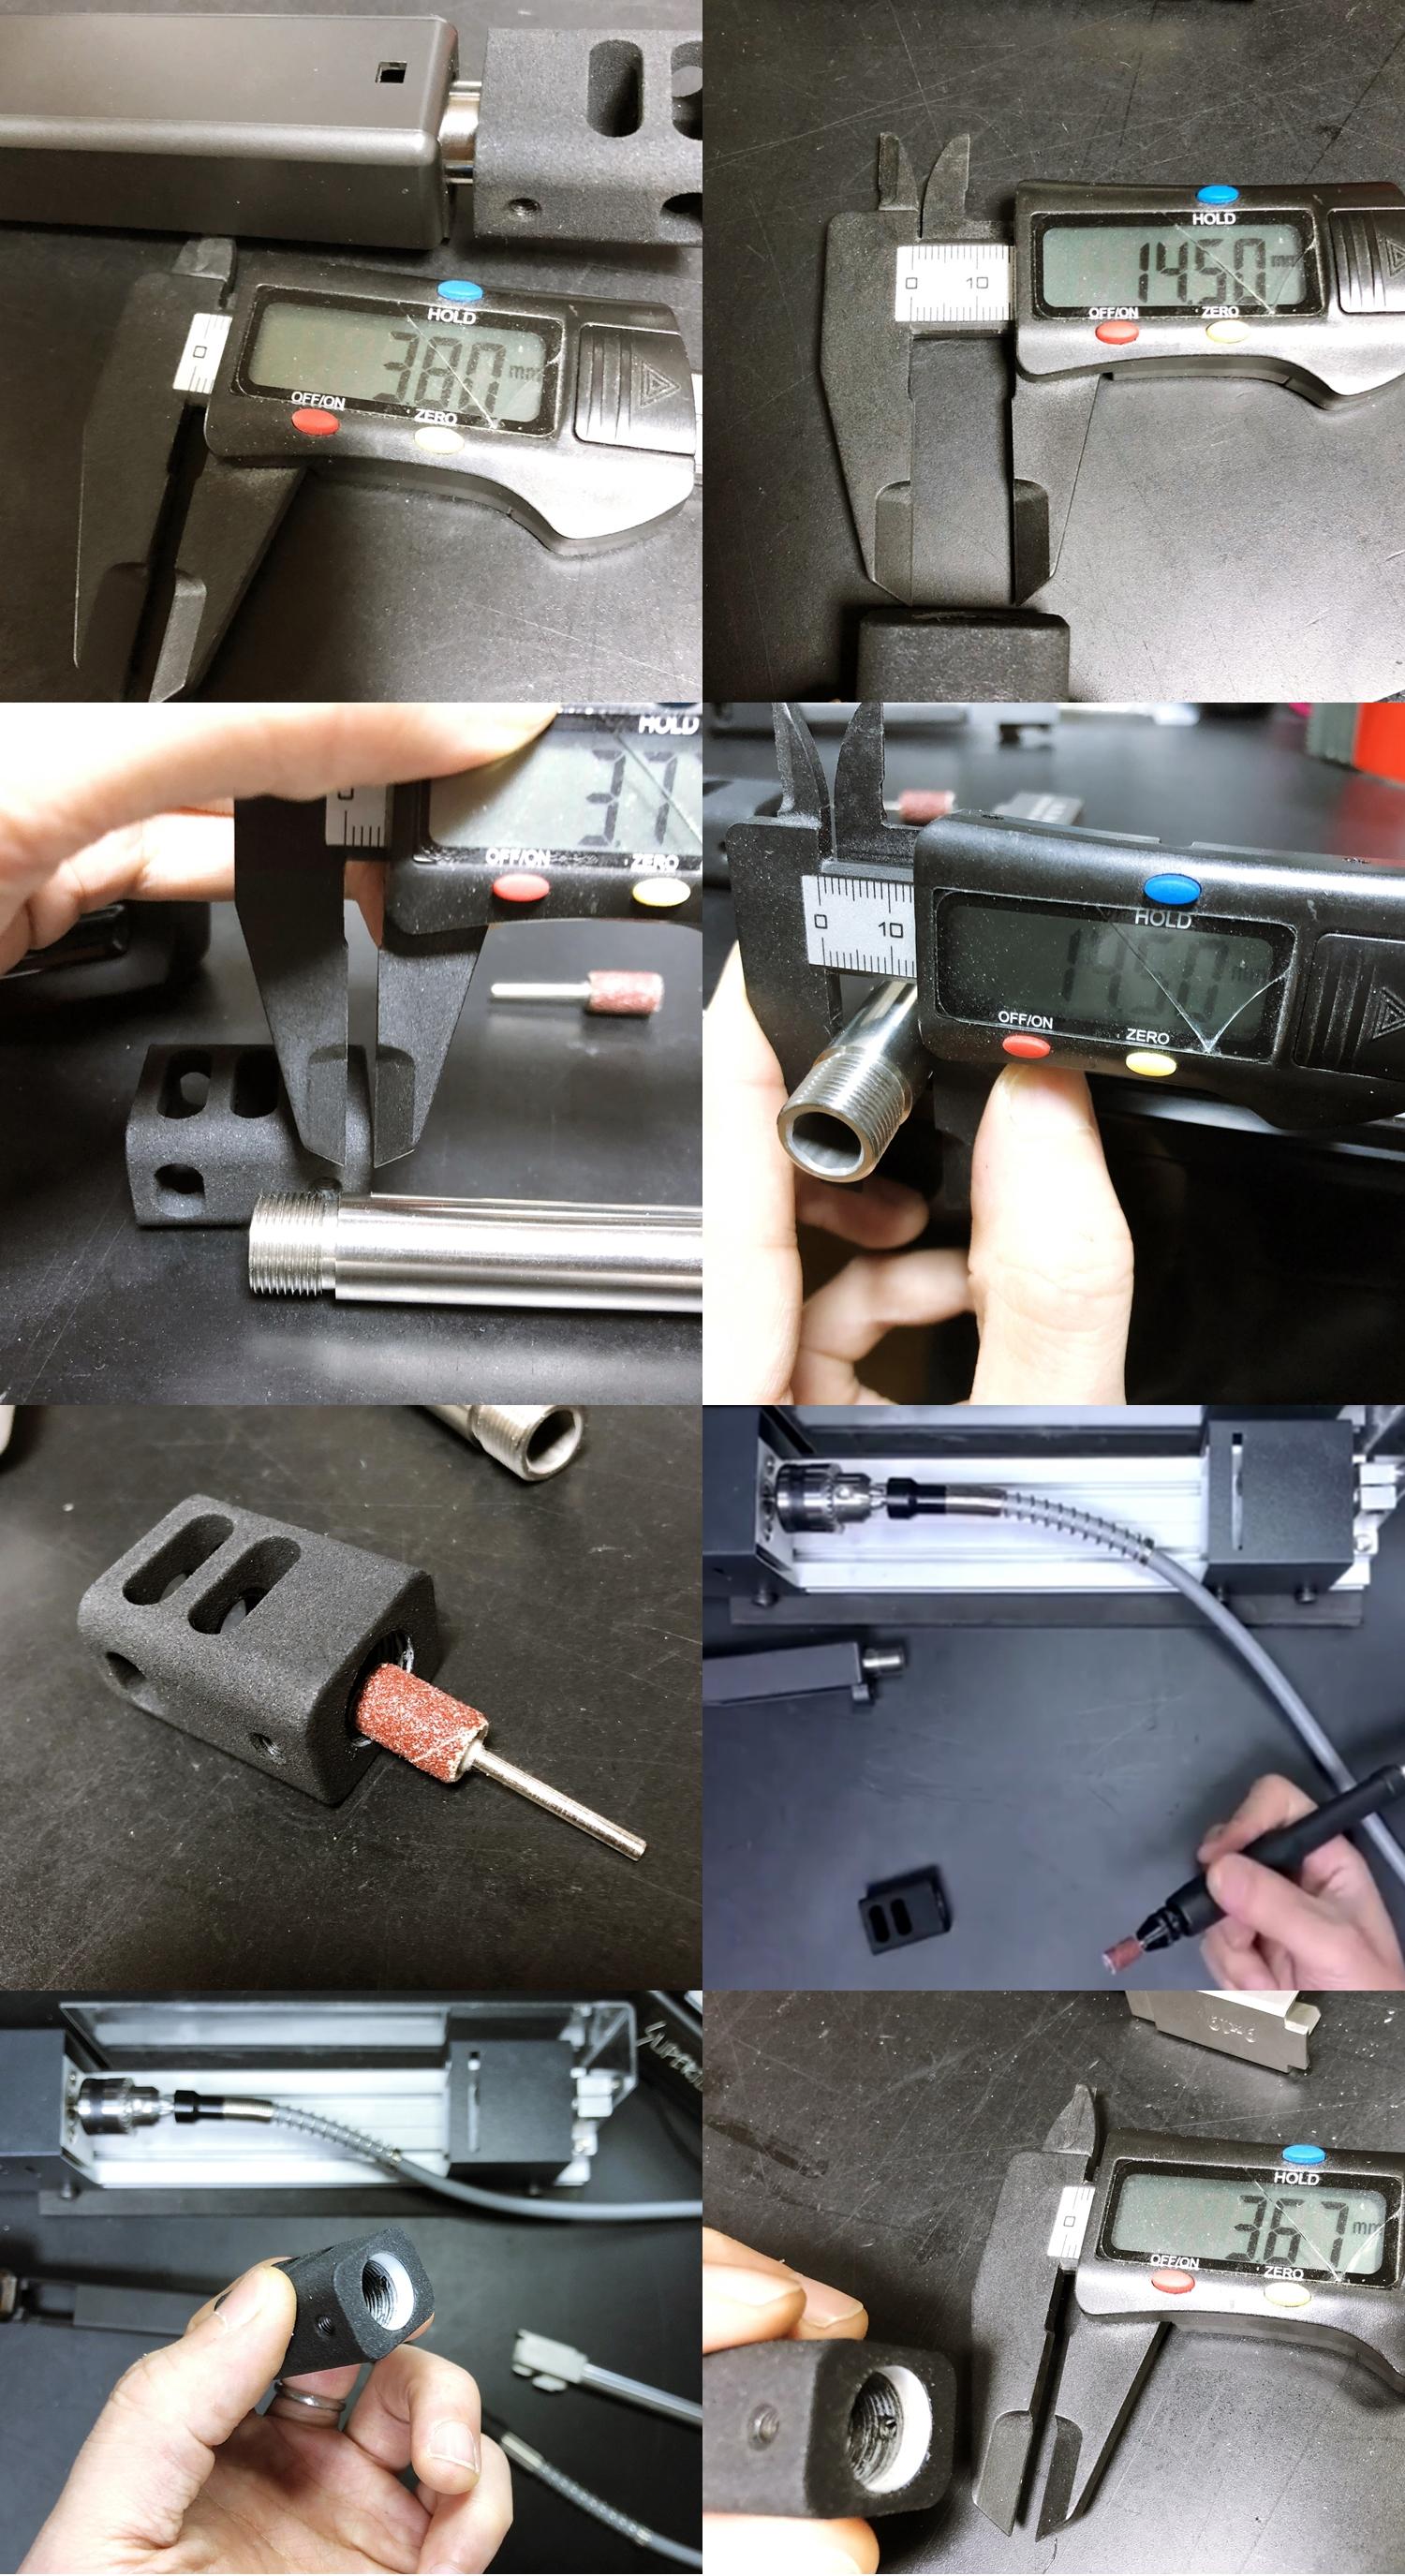 8 Guns Modify KKM PRECISION GLOCK ステンレスアウターバレル 東京マルイ G17 G18C GBB GET! リアルで重量感あるCNC 精密切り出し加工! BARREL+PROTECTOR+ショートリコイルアシストスプリング+インナーバレルセット